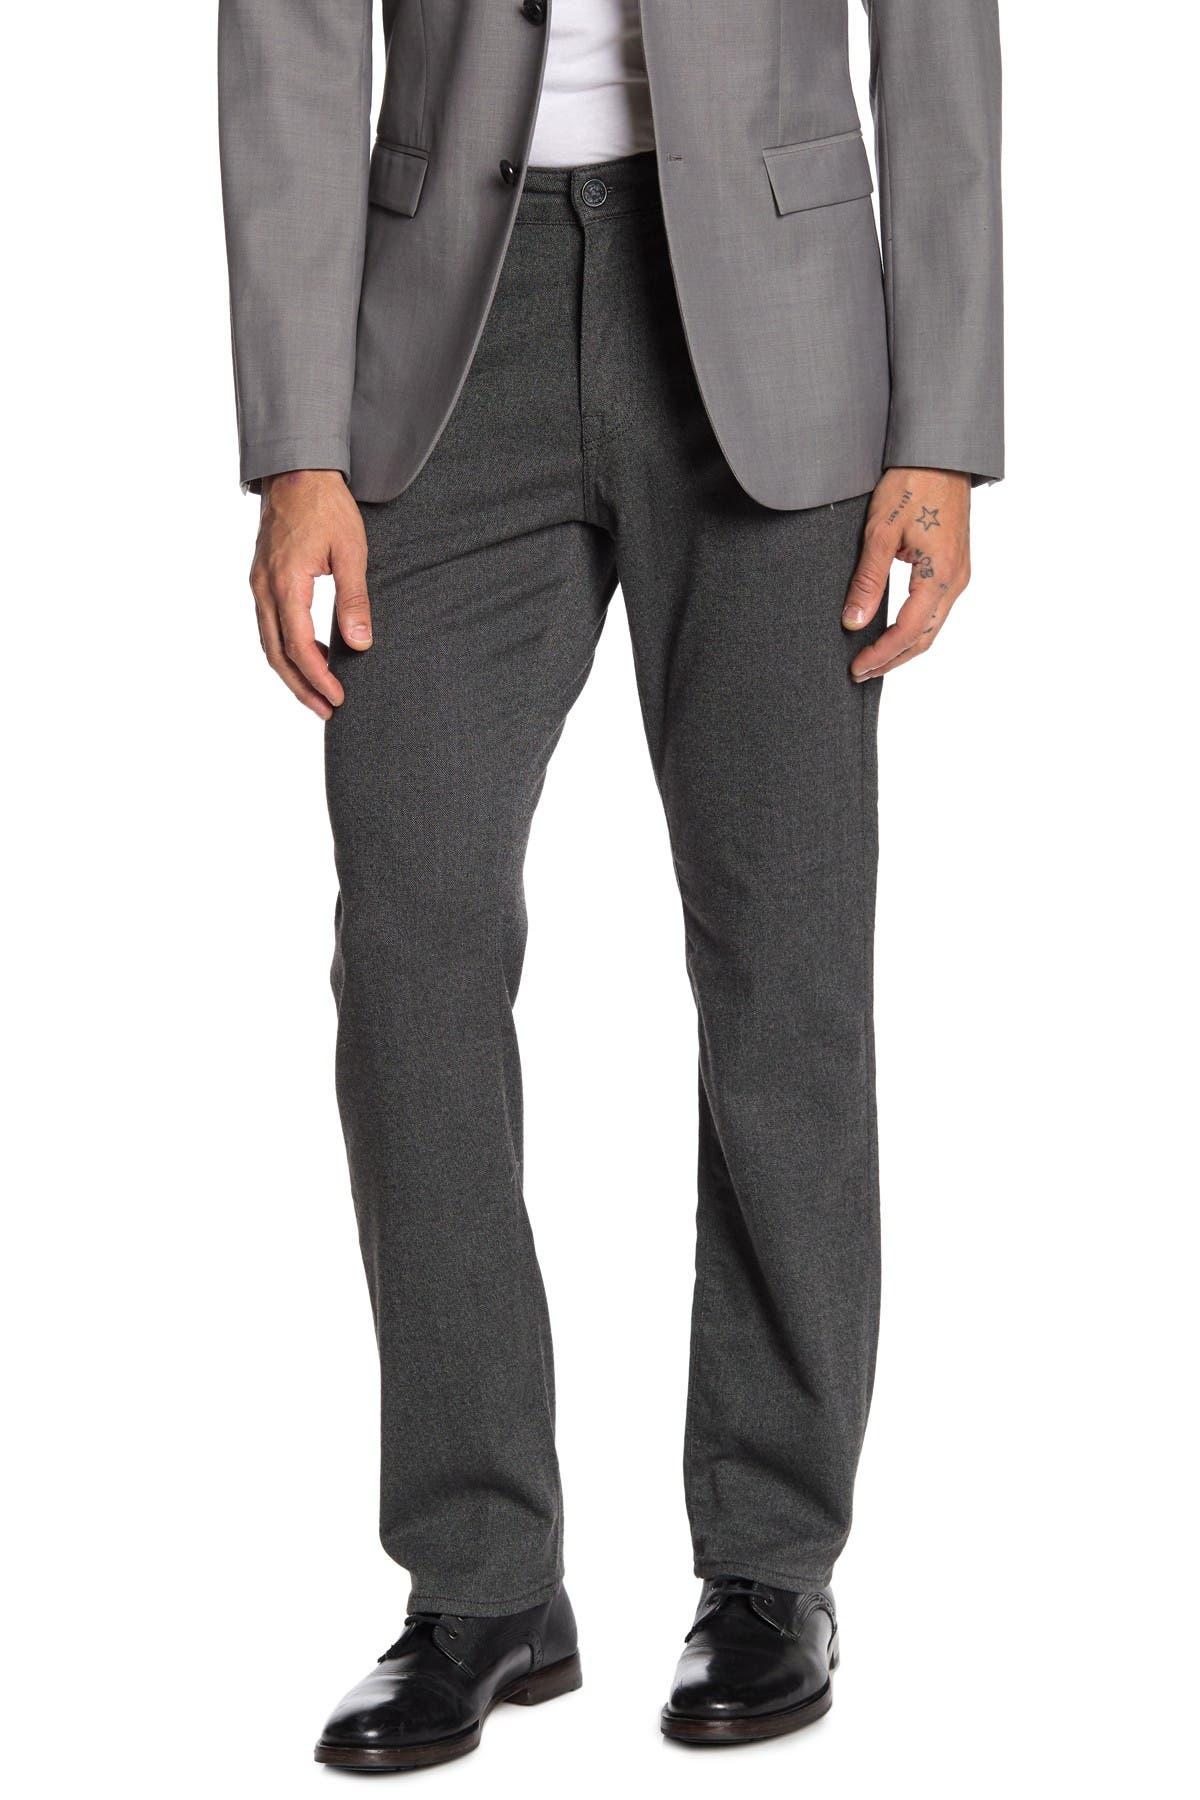 "Image of 34 Heritage Charisma Comfort Rise Classic Pants - 30-32"" Inseam"